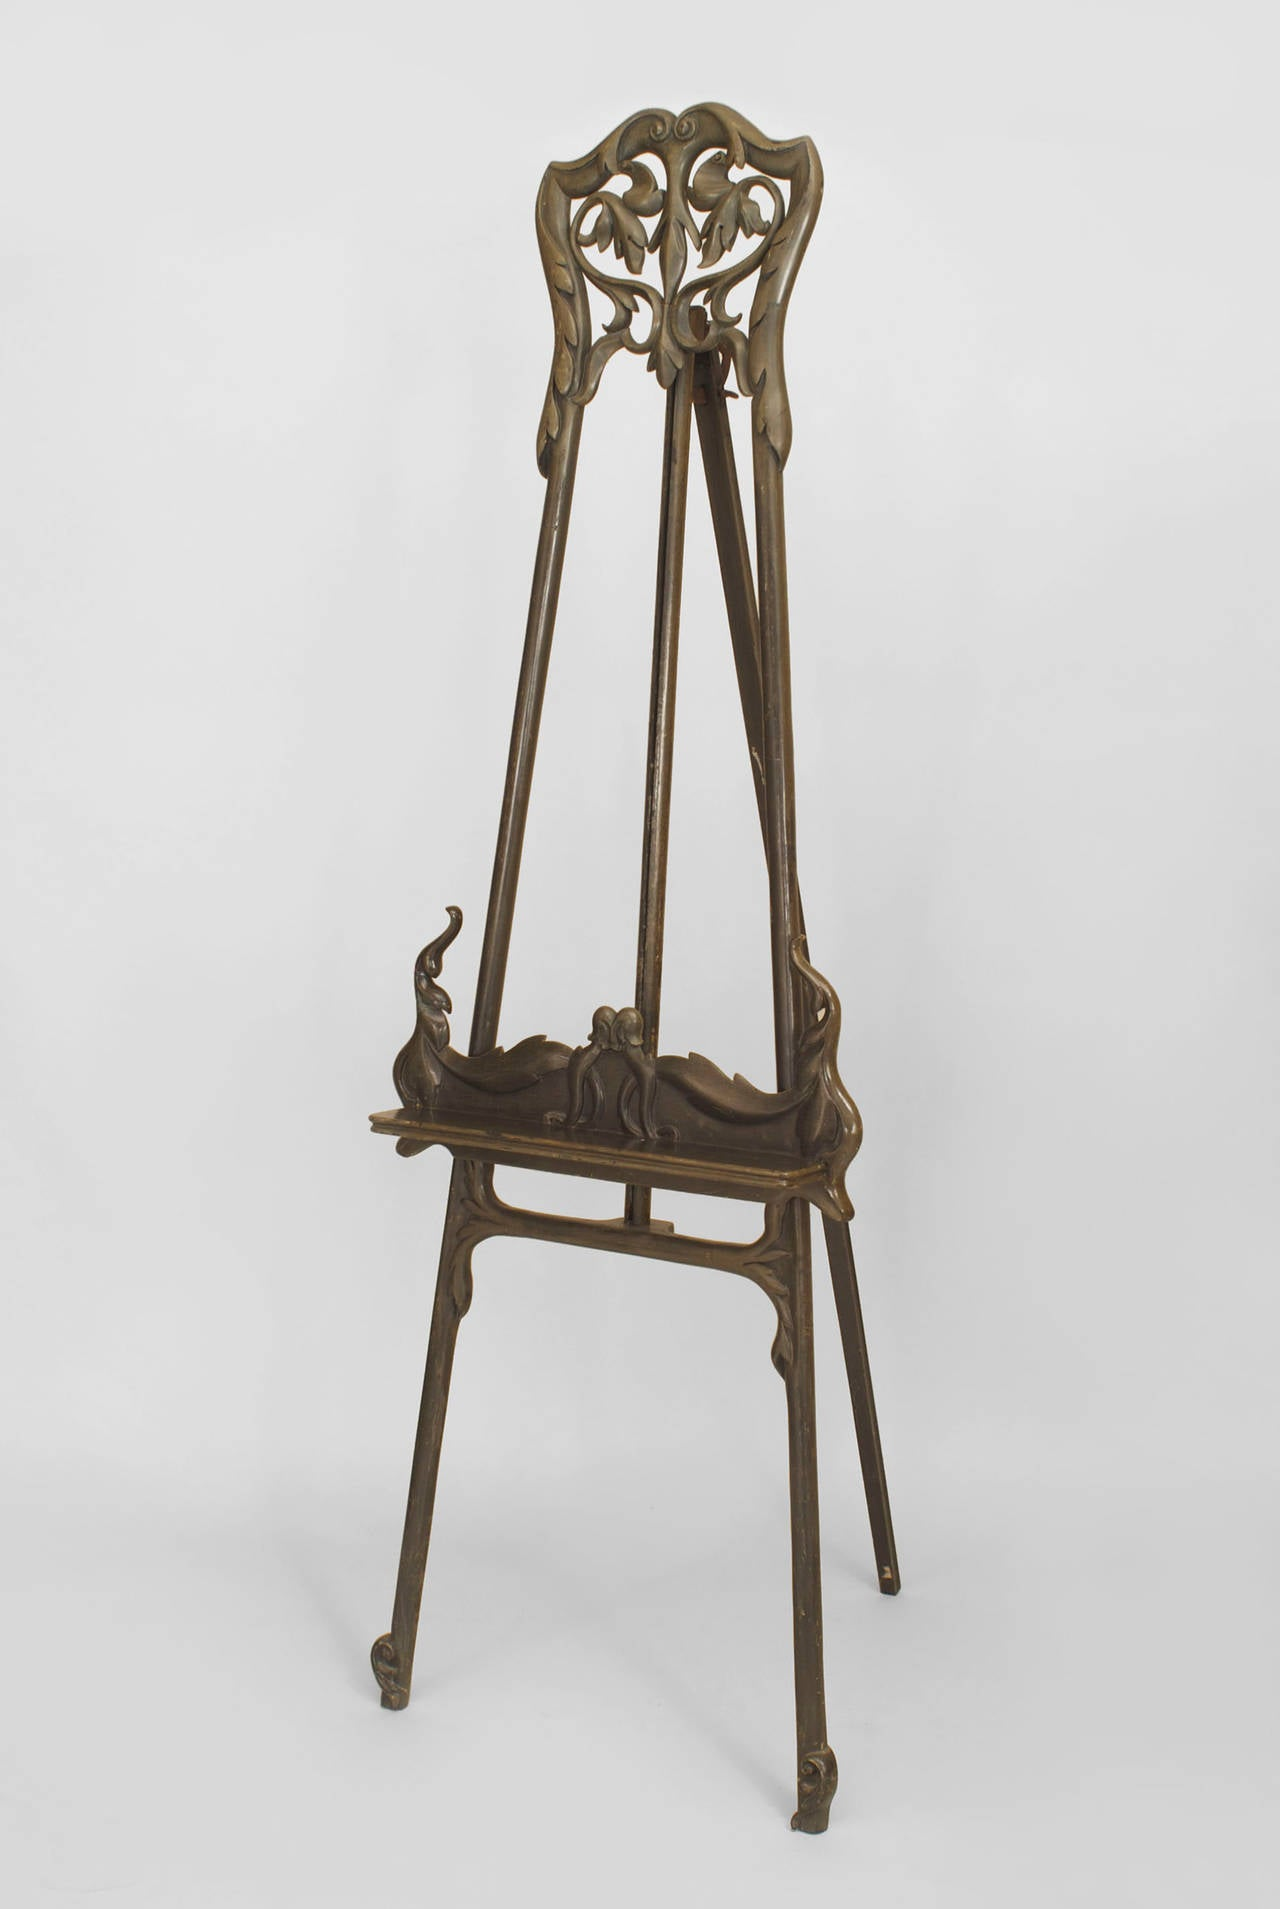 modern art nouveau furniture. turn of the century art nouveau filigreed easel or stand 2 modern furniture c